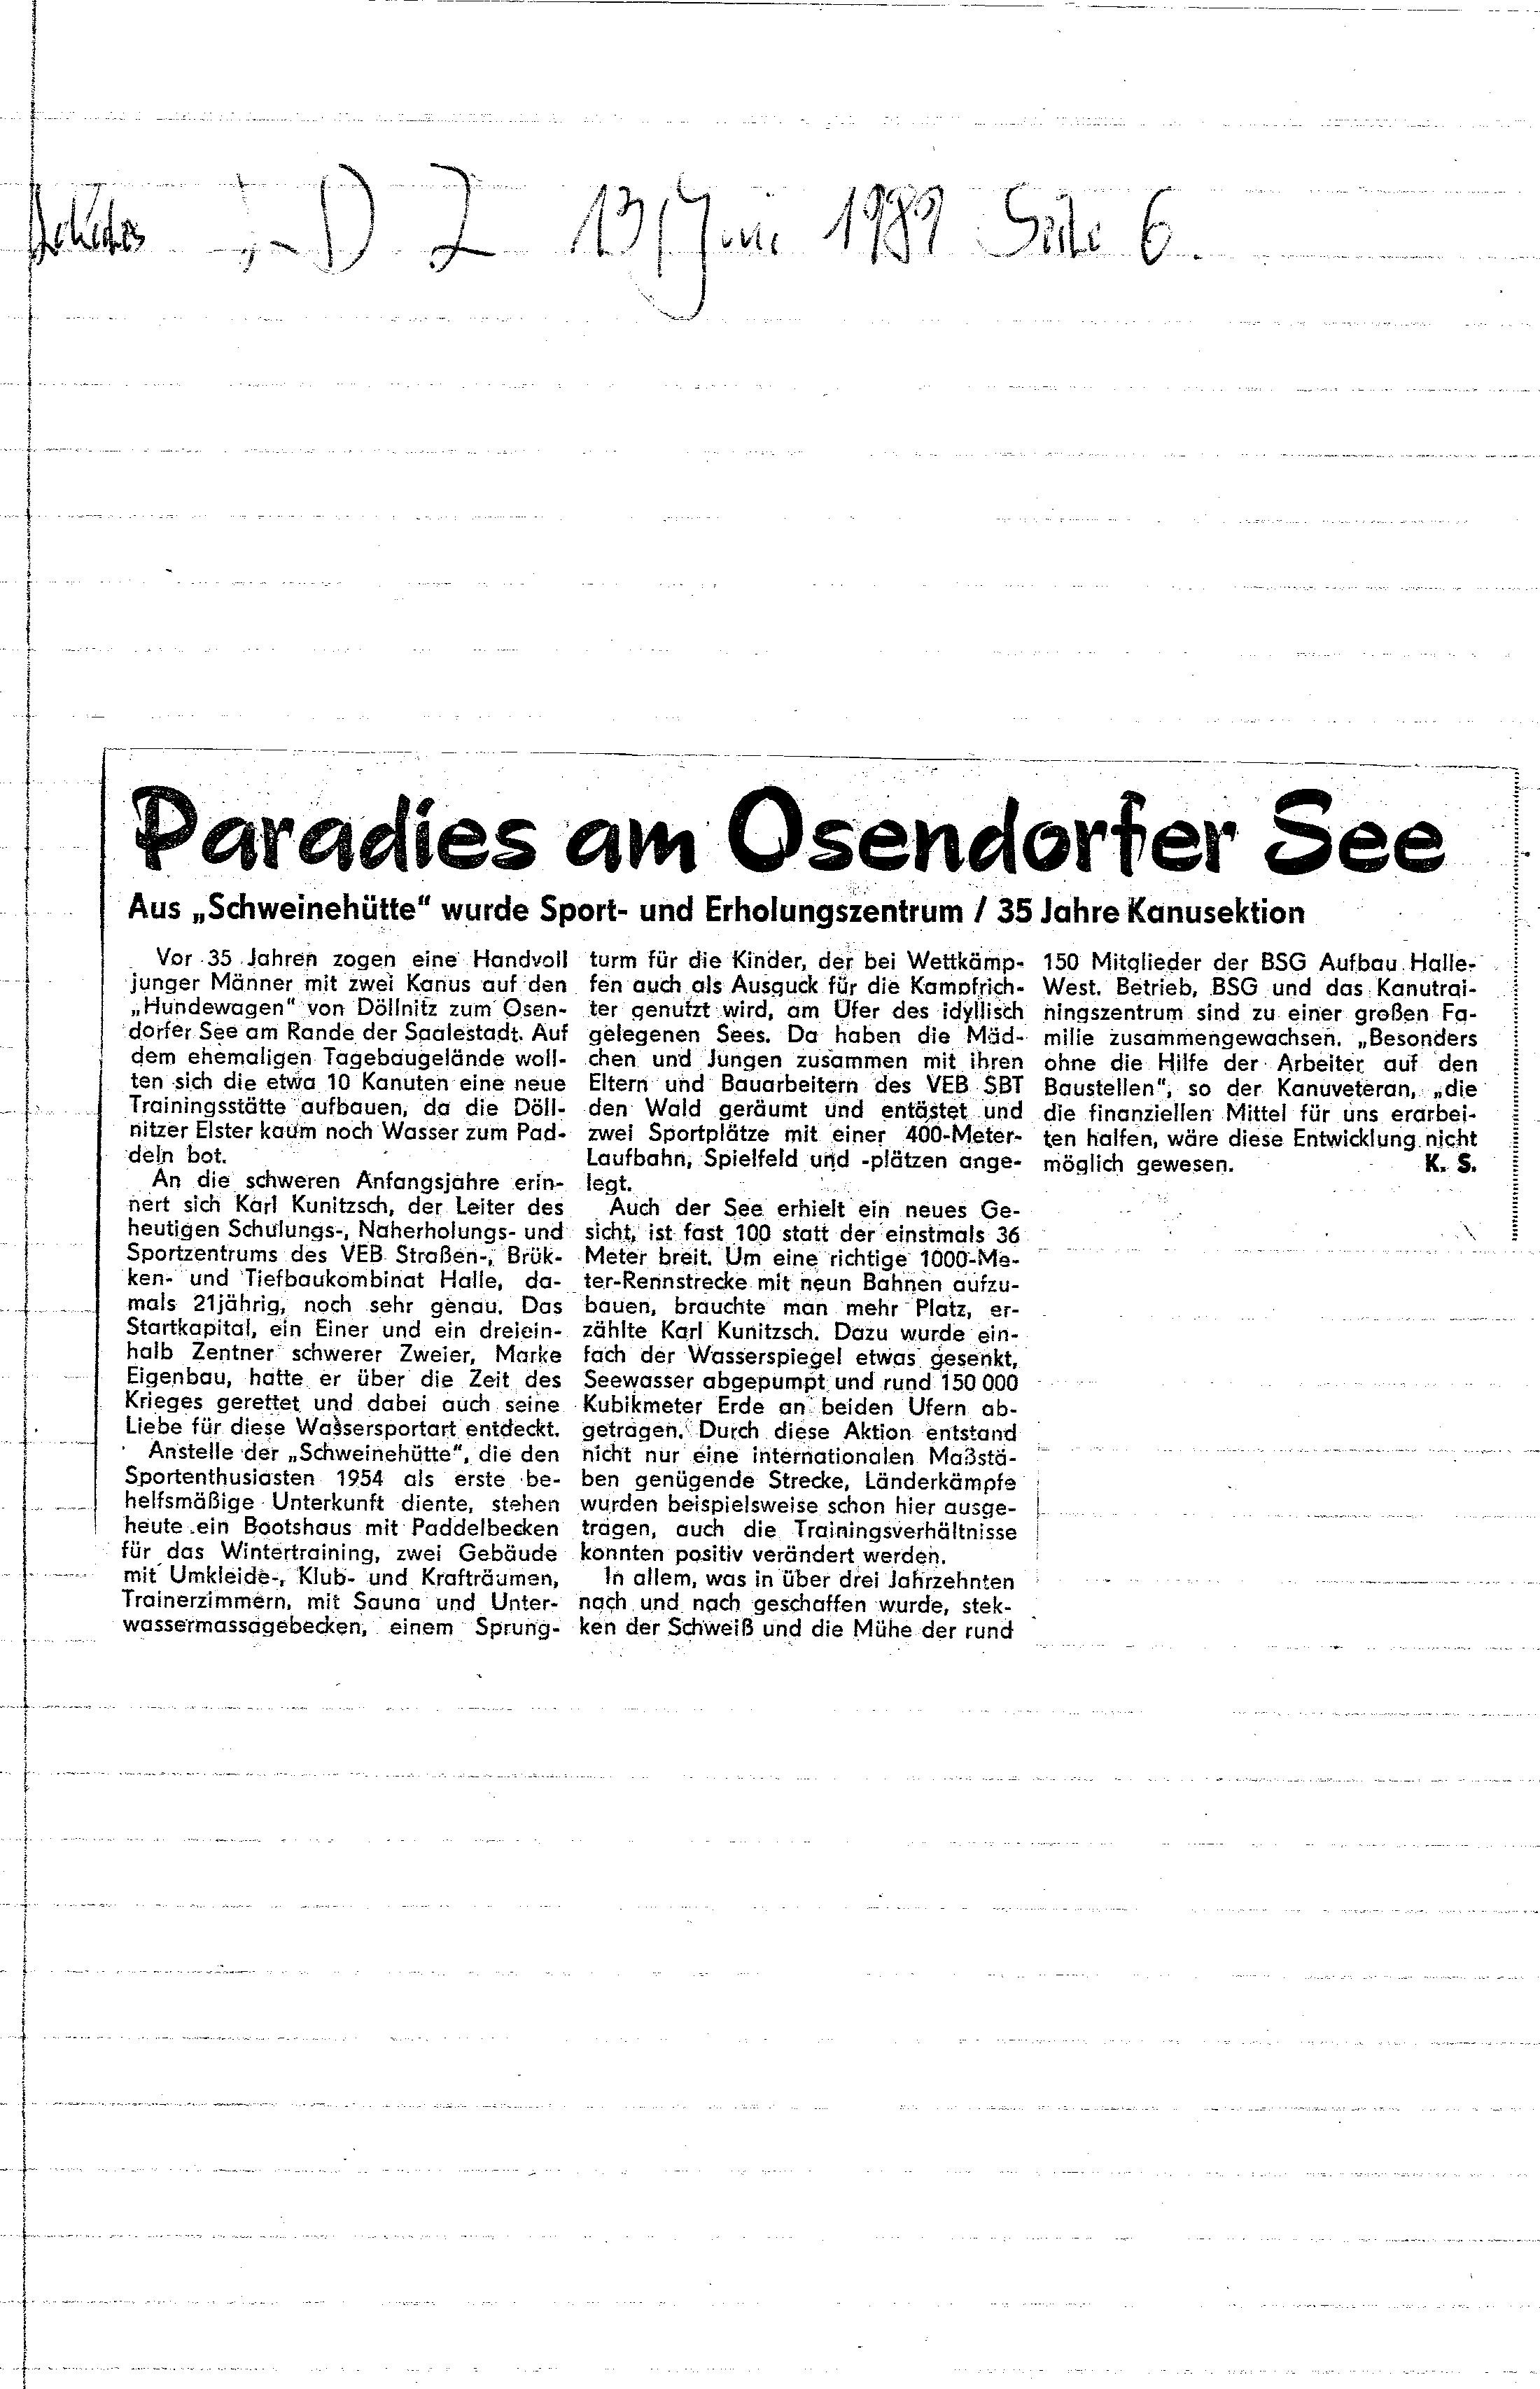 1989-06-13 Paradies am Osendorfer See